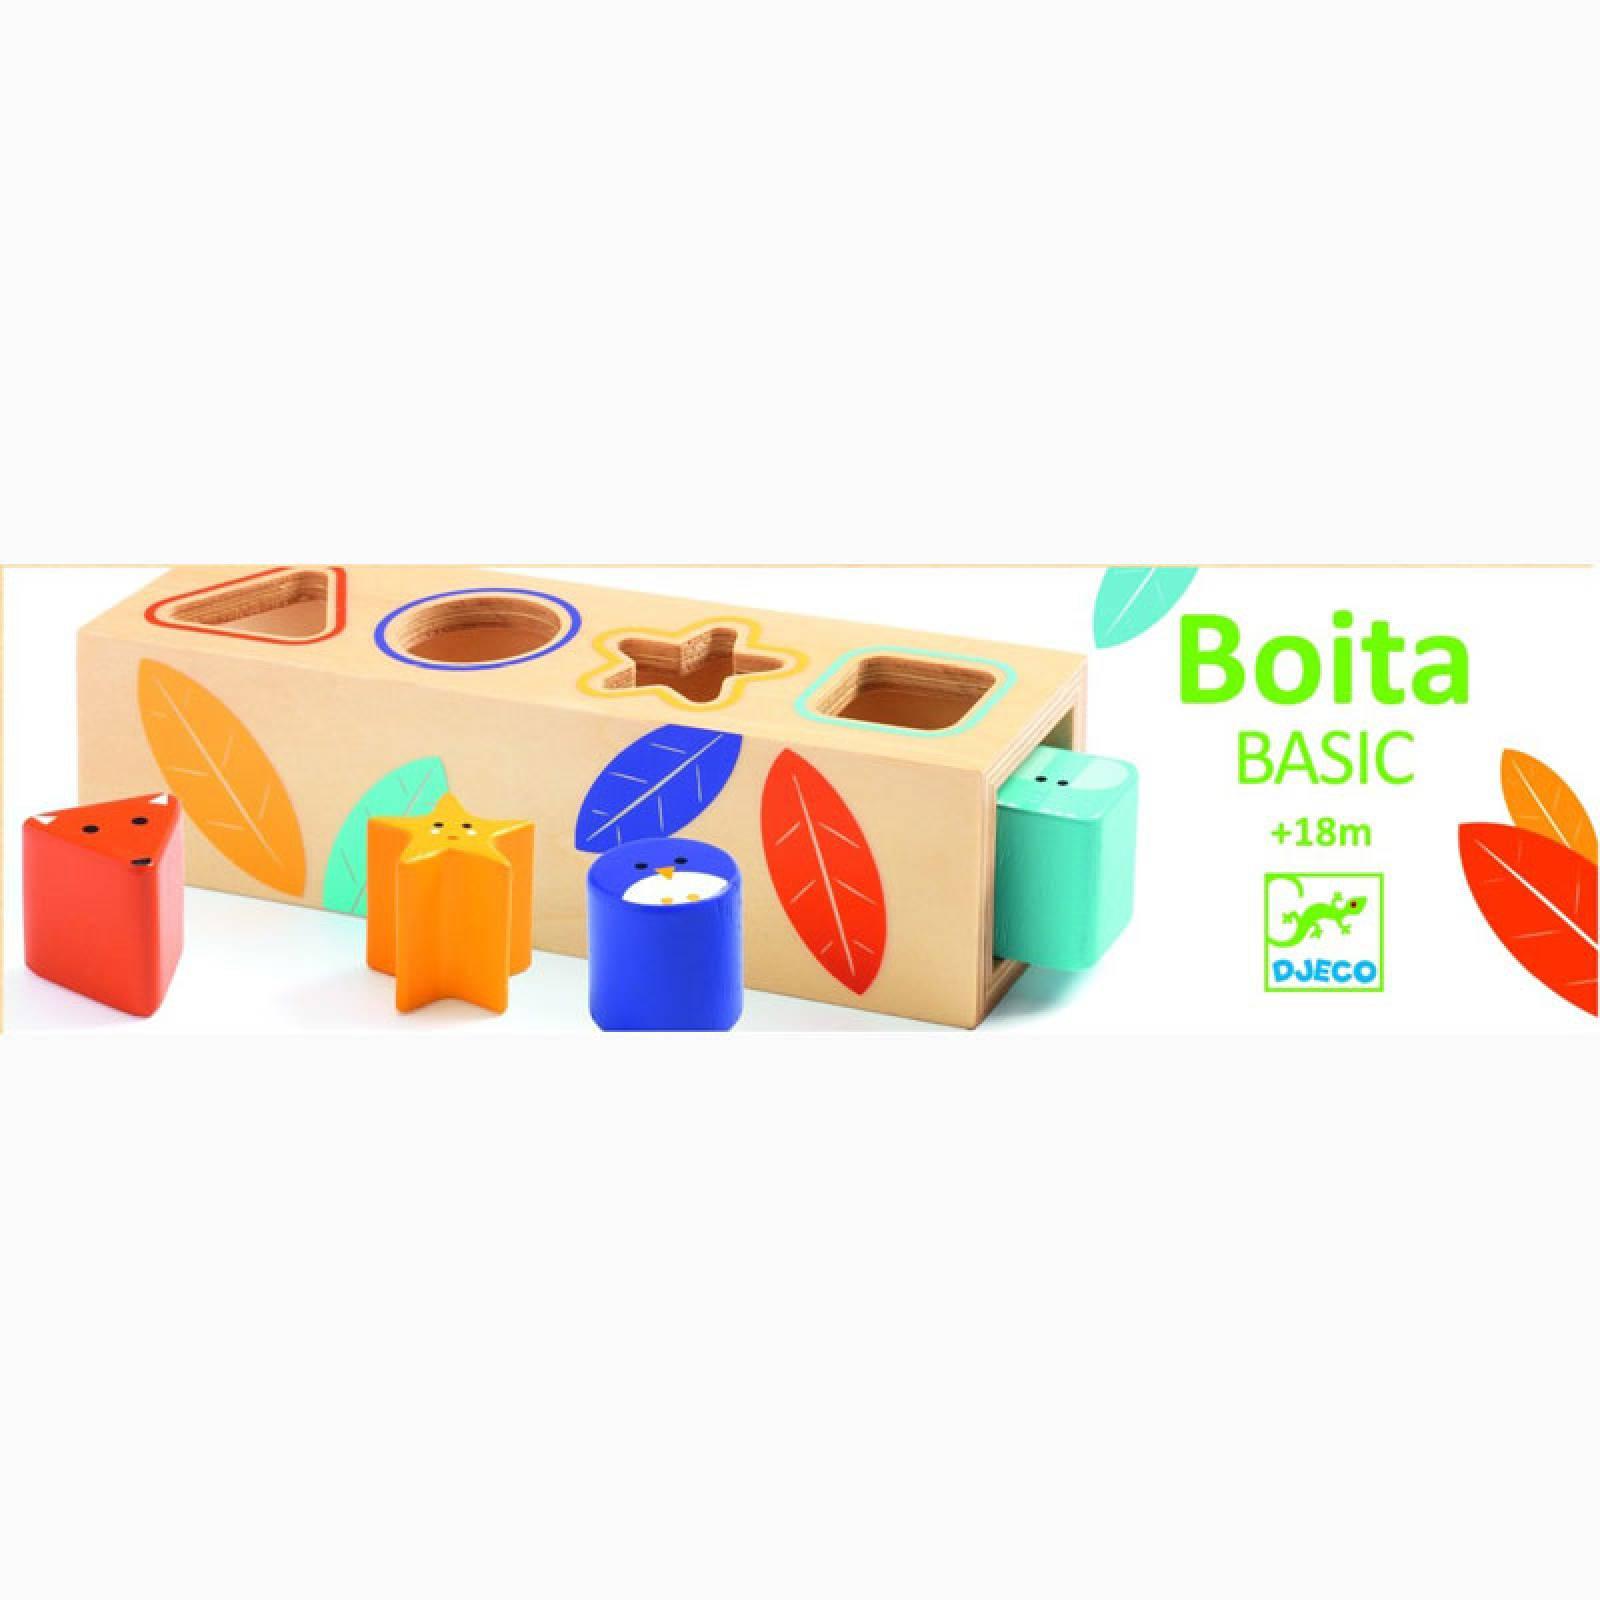 Boita Basic Wooden Shape Sorter Toy 18m+